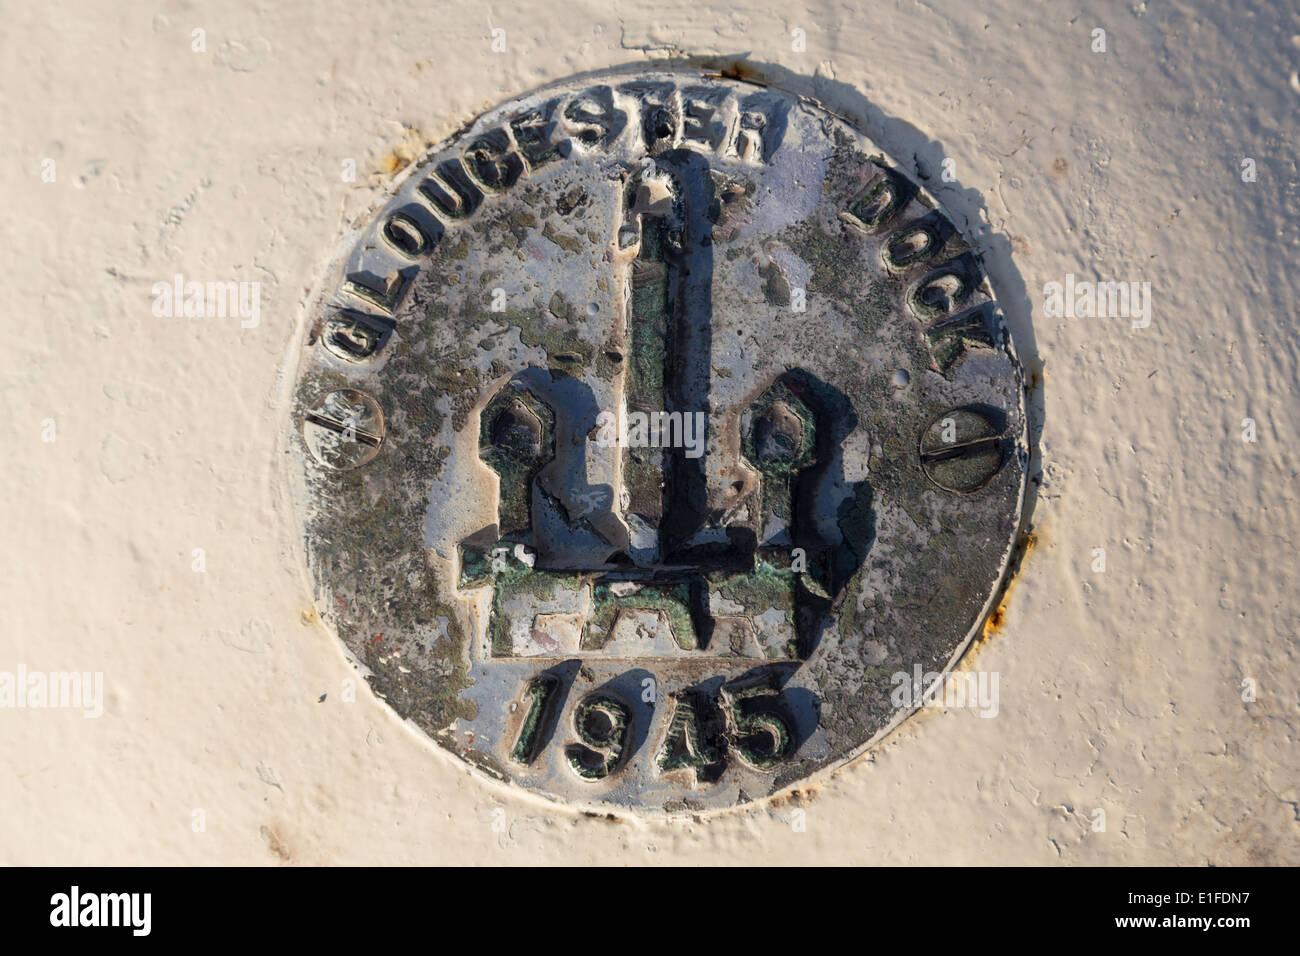 UK, Gloucester, Gloucester, dock plate. - Stock Image